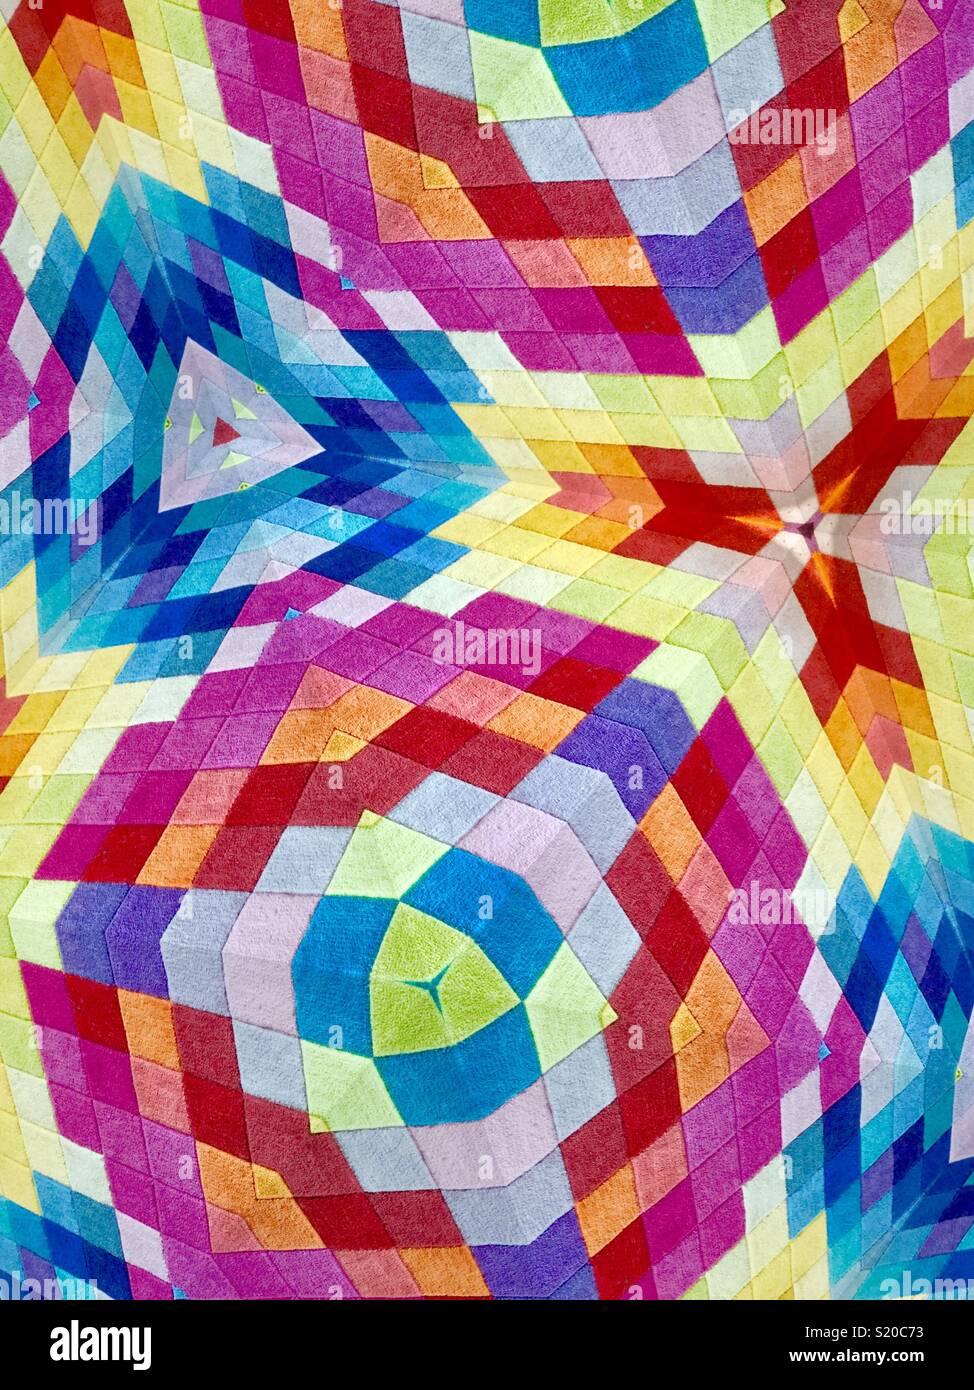 Tridimensionali di patchwork Immagini Stock